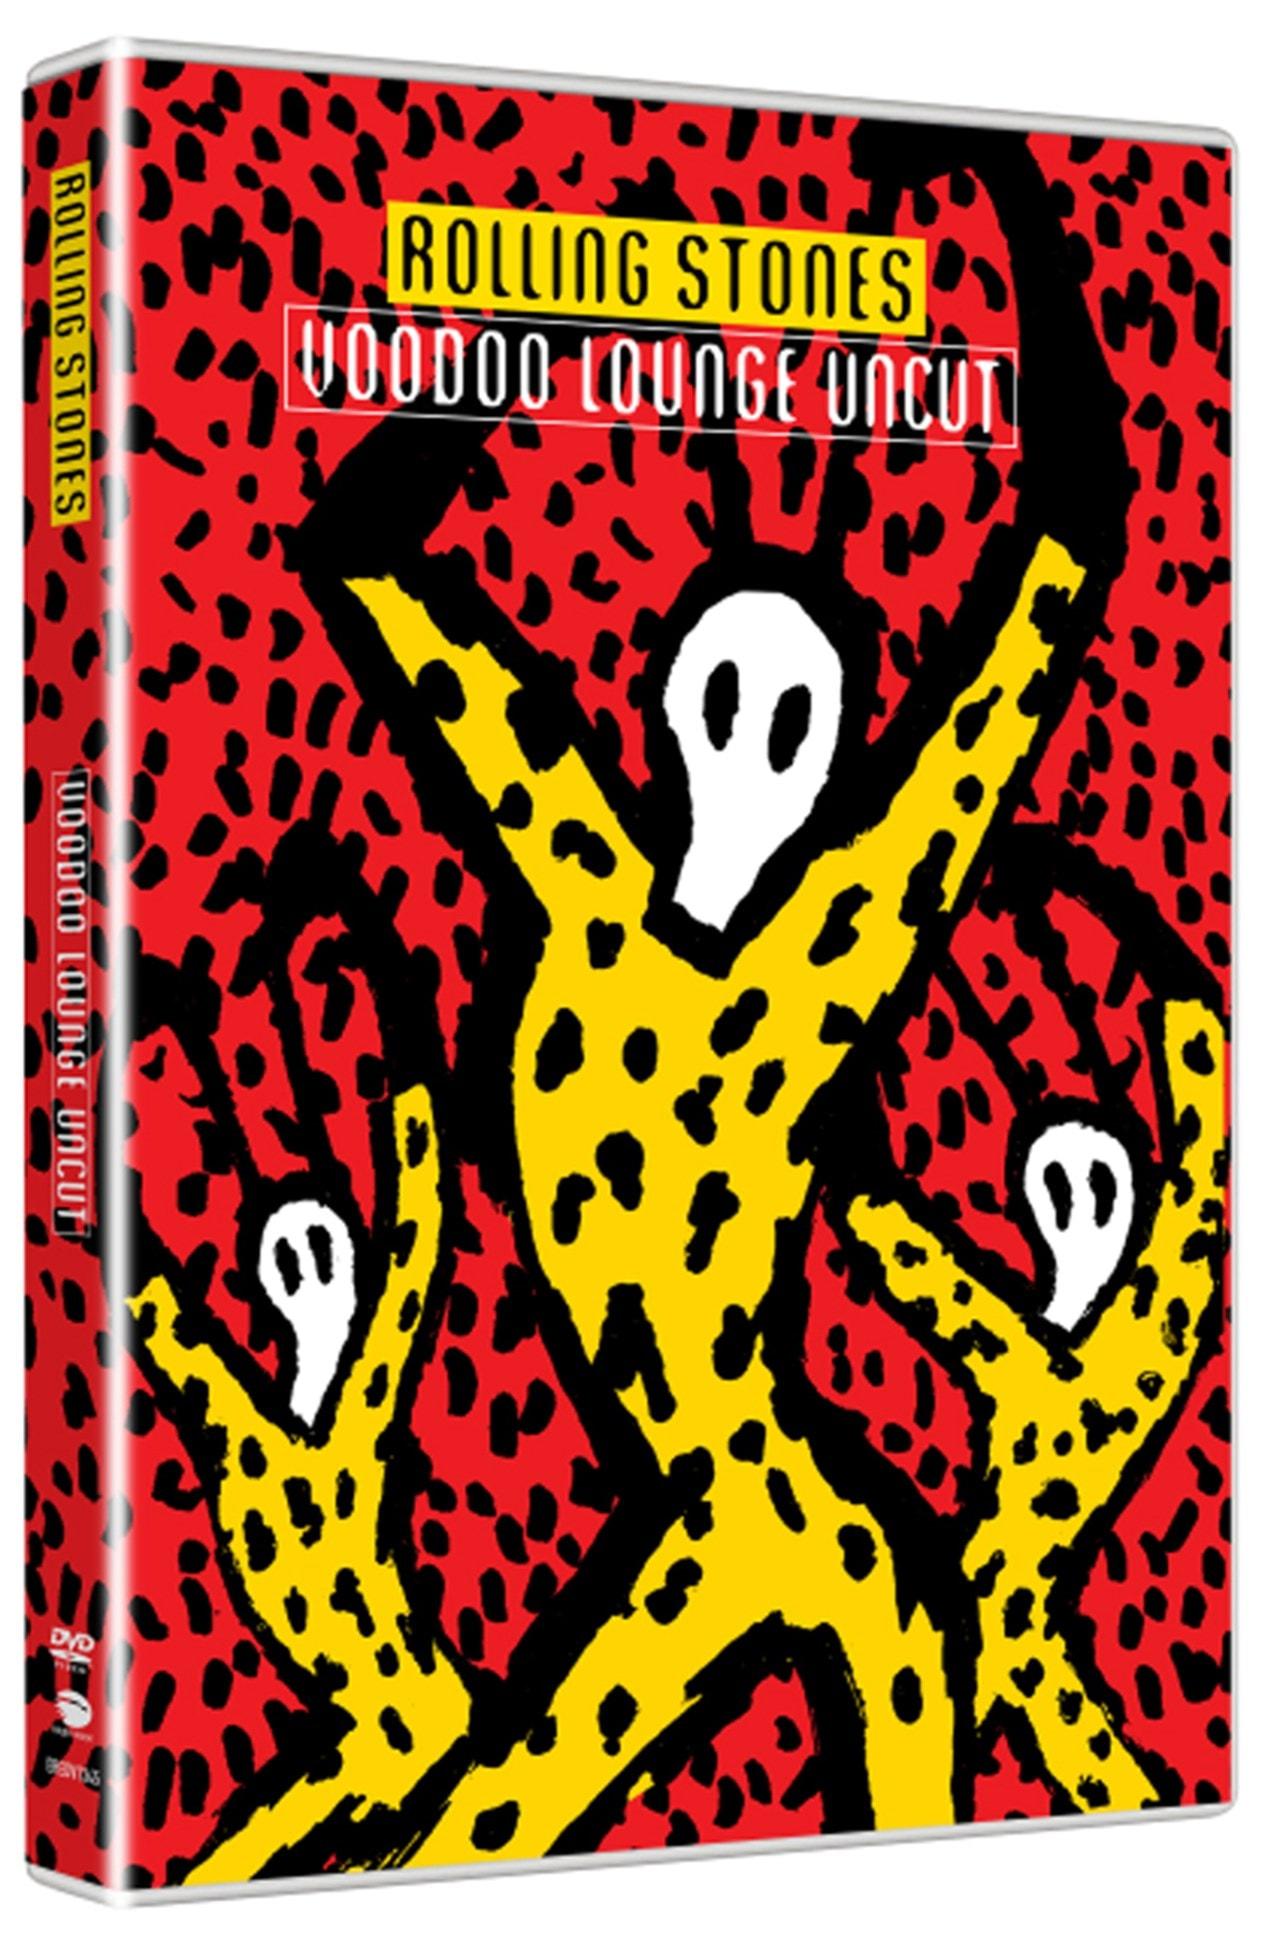 The Rolling Stones: Voodoo Lounge Uncut - 1